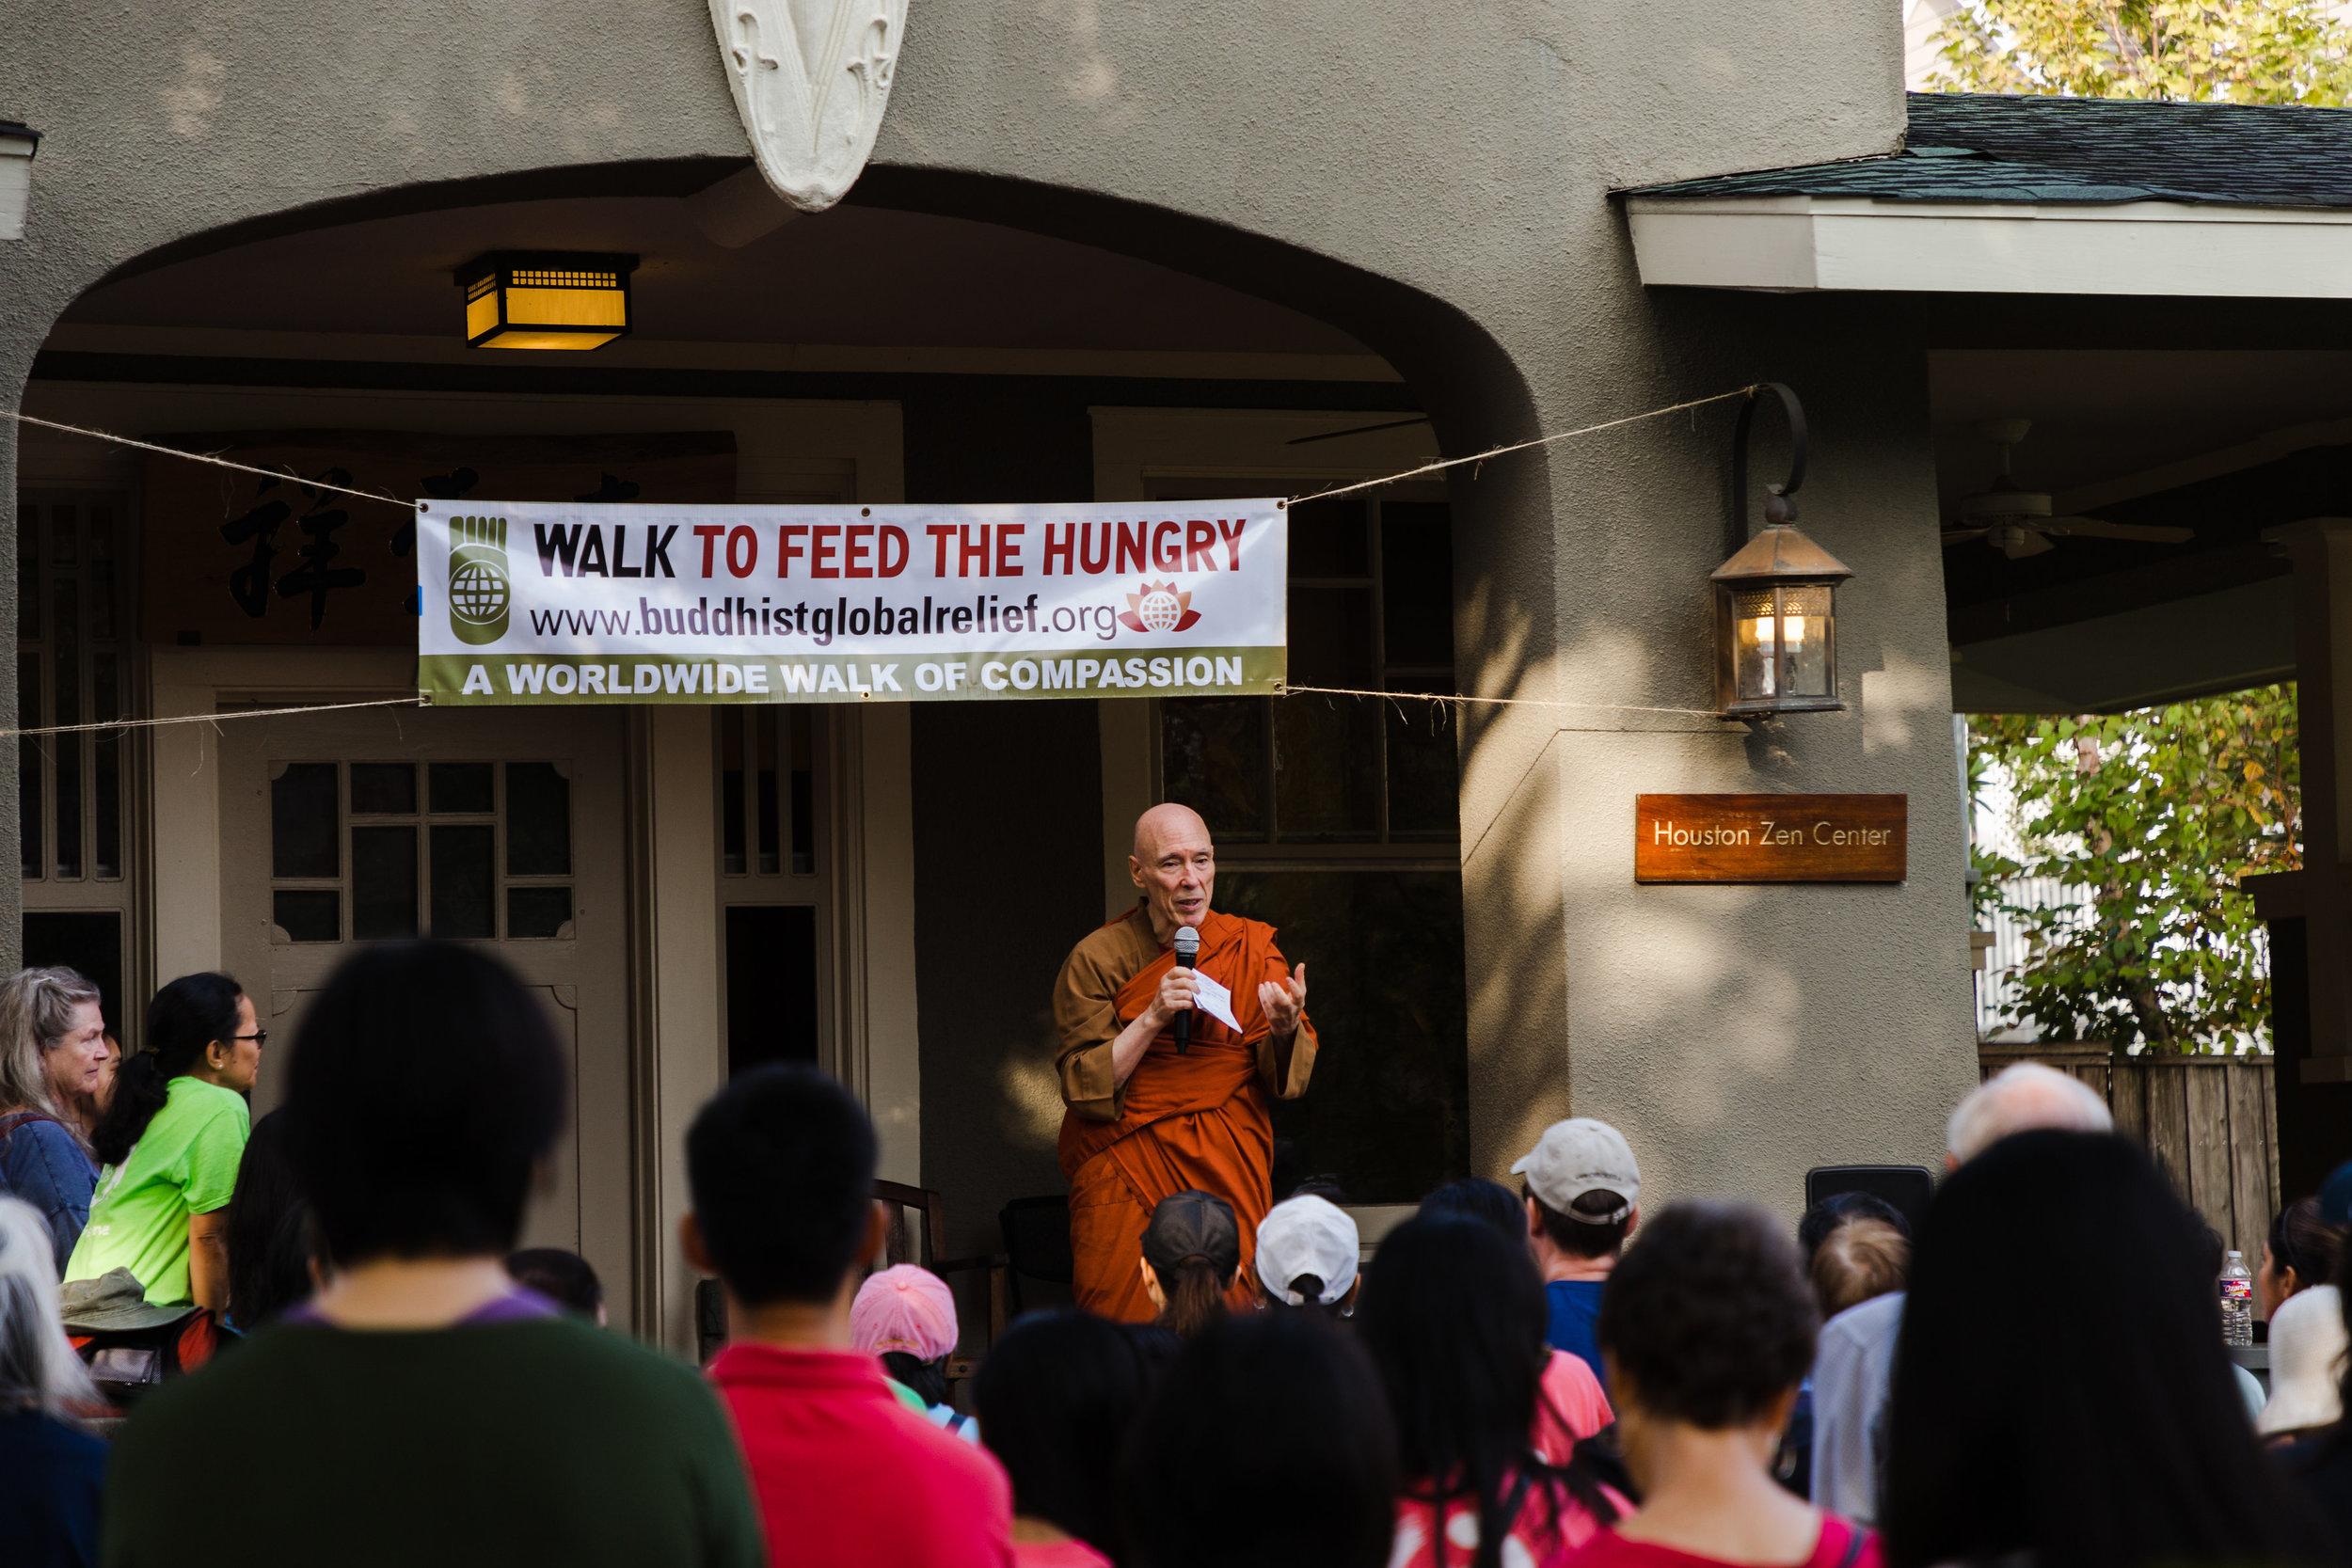 Bhikkhu-Bodhi-Global-Relief-Houston-Zen-Walk-36.jpg